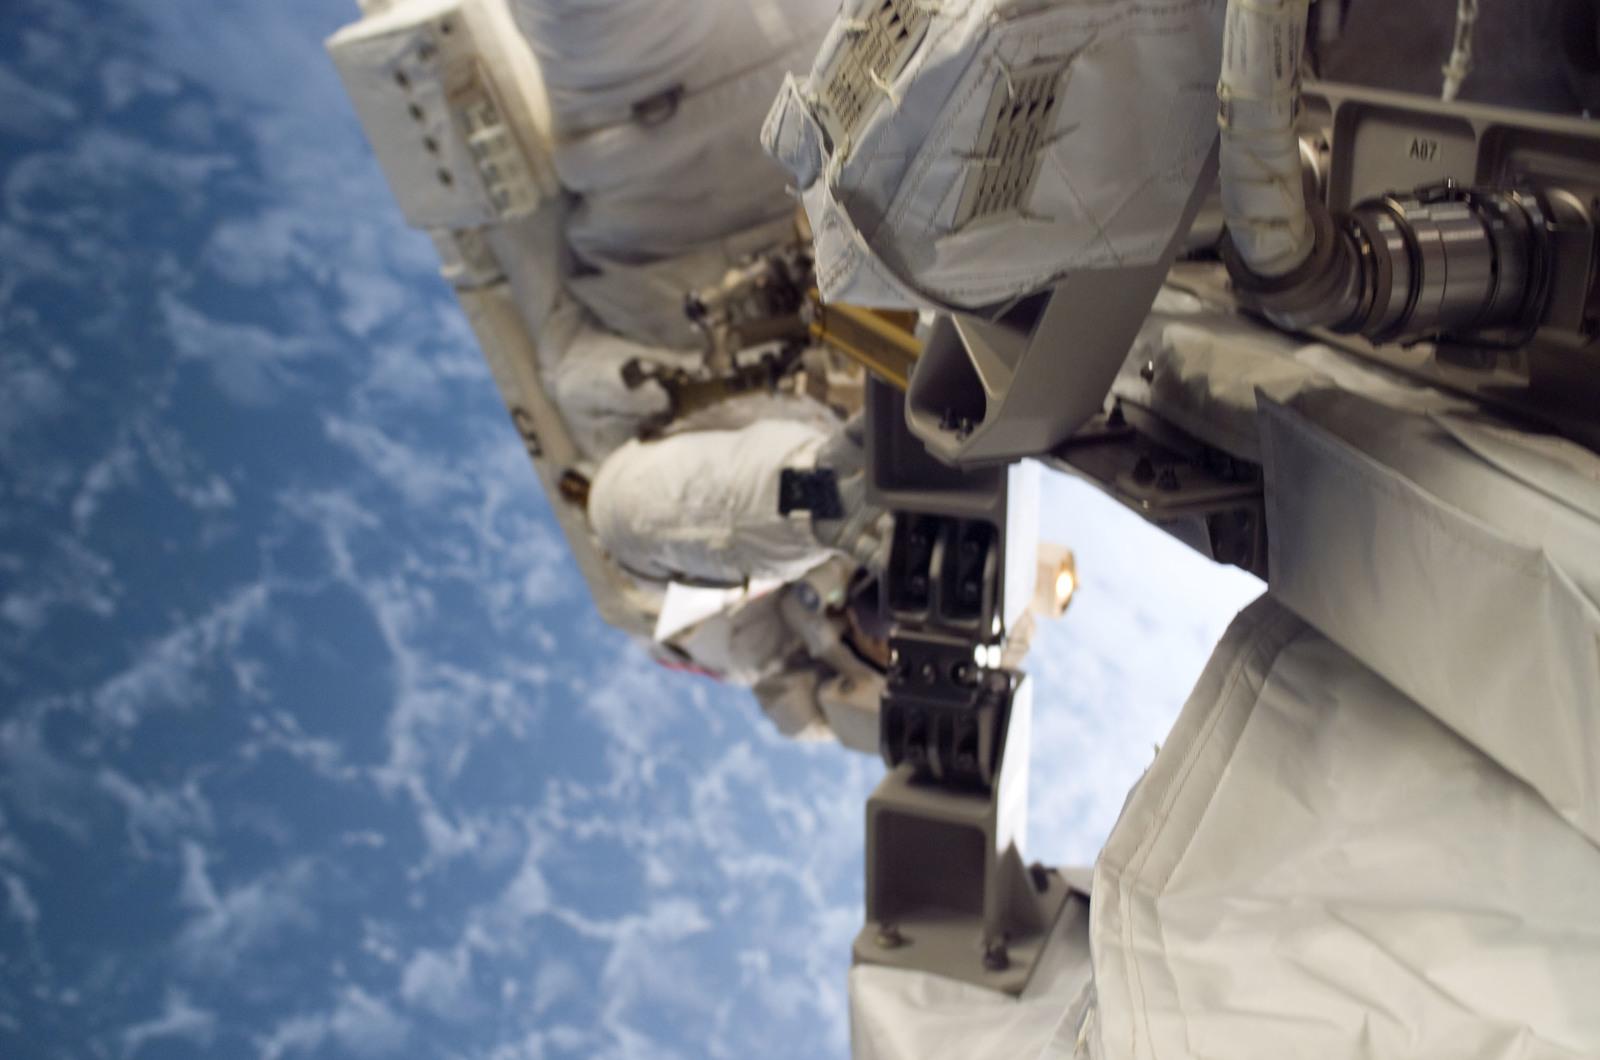 S115E05828 - STS-115 - MacLean performing second EVA spacewalk